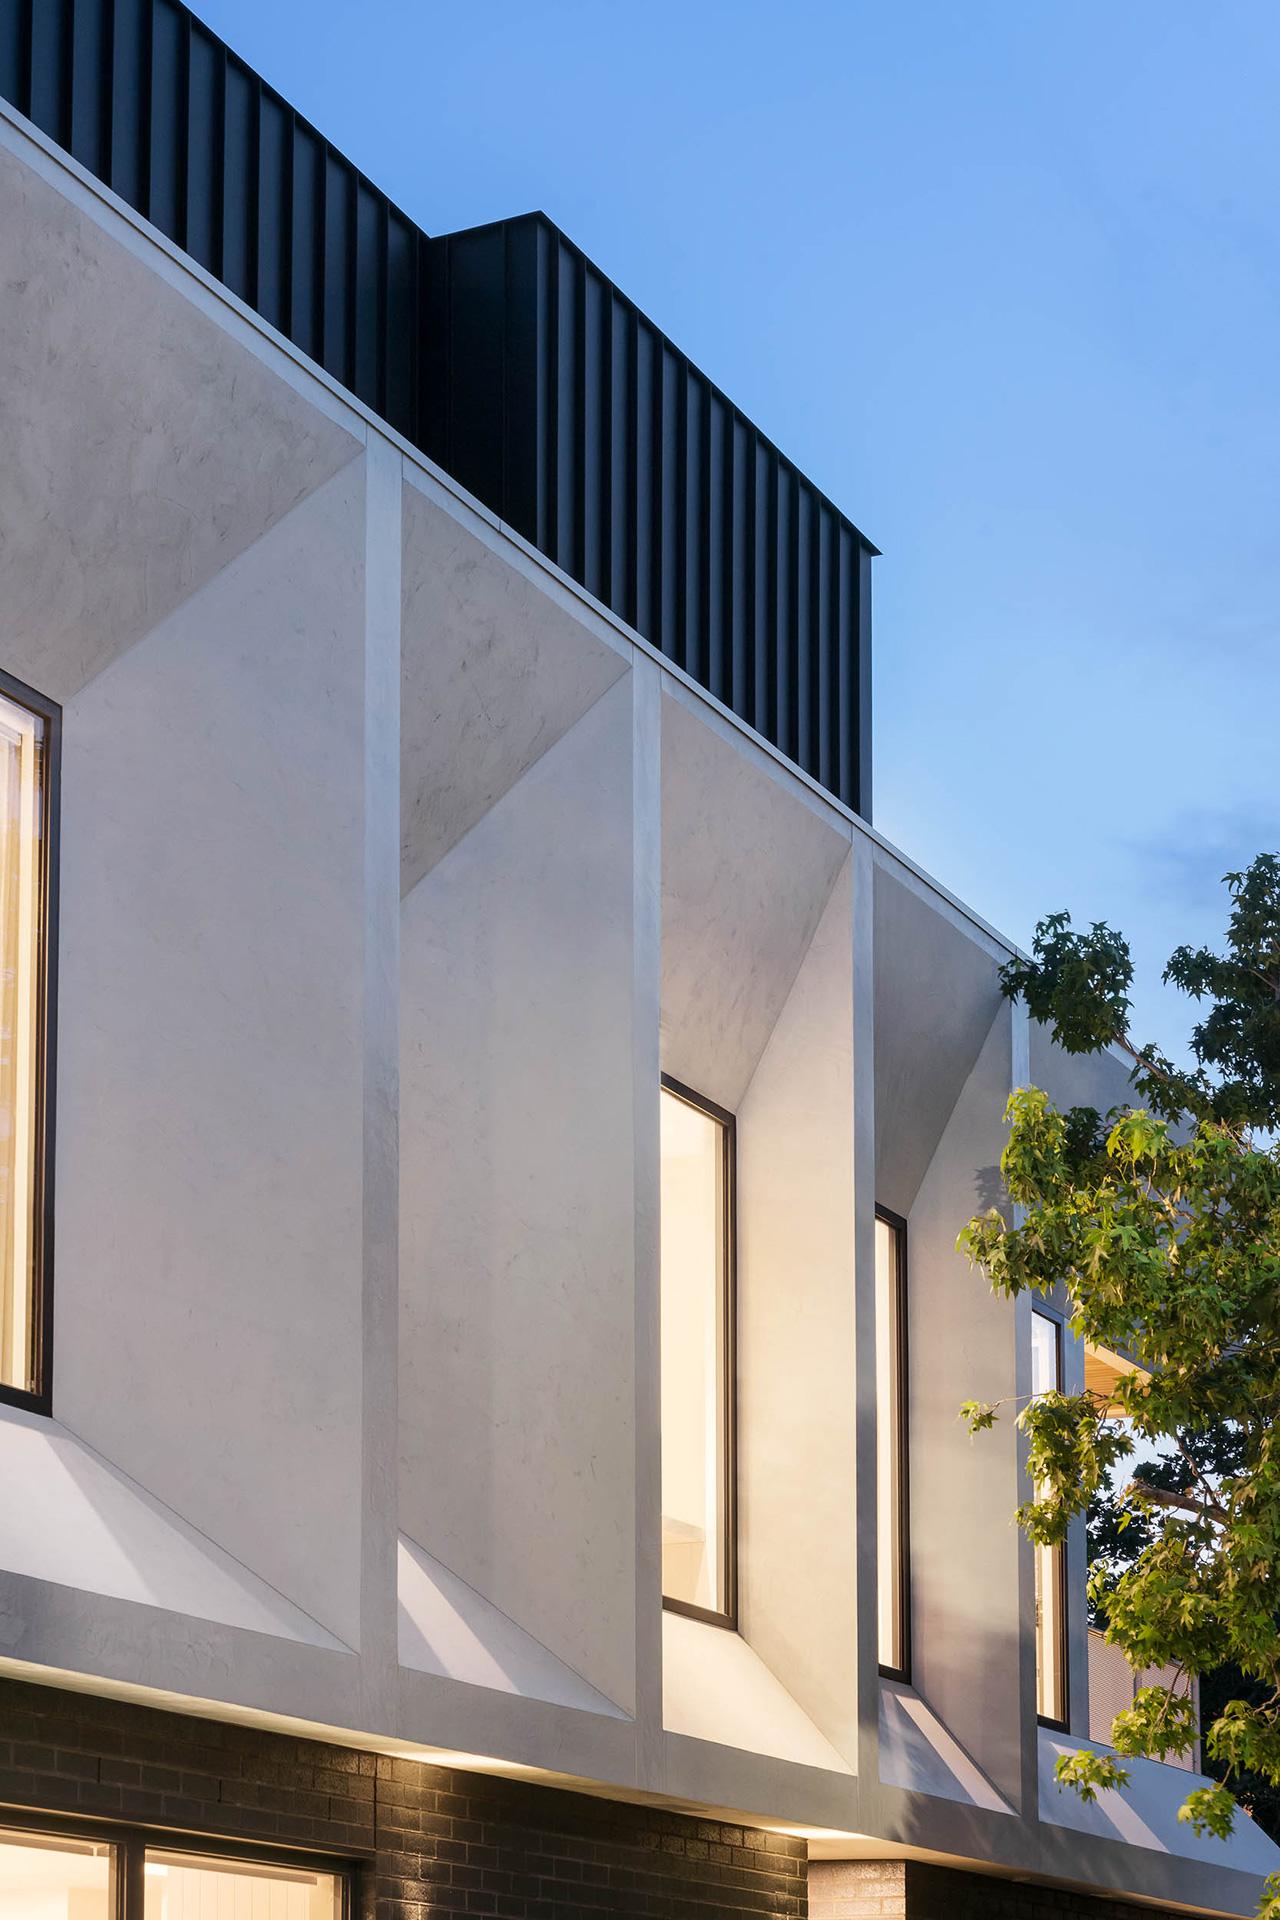 external-facade-close-up-angles-elwood-multi-res-development-ckarch